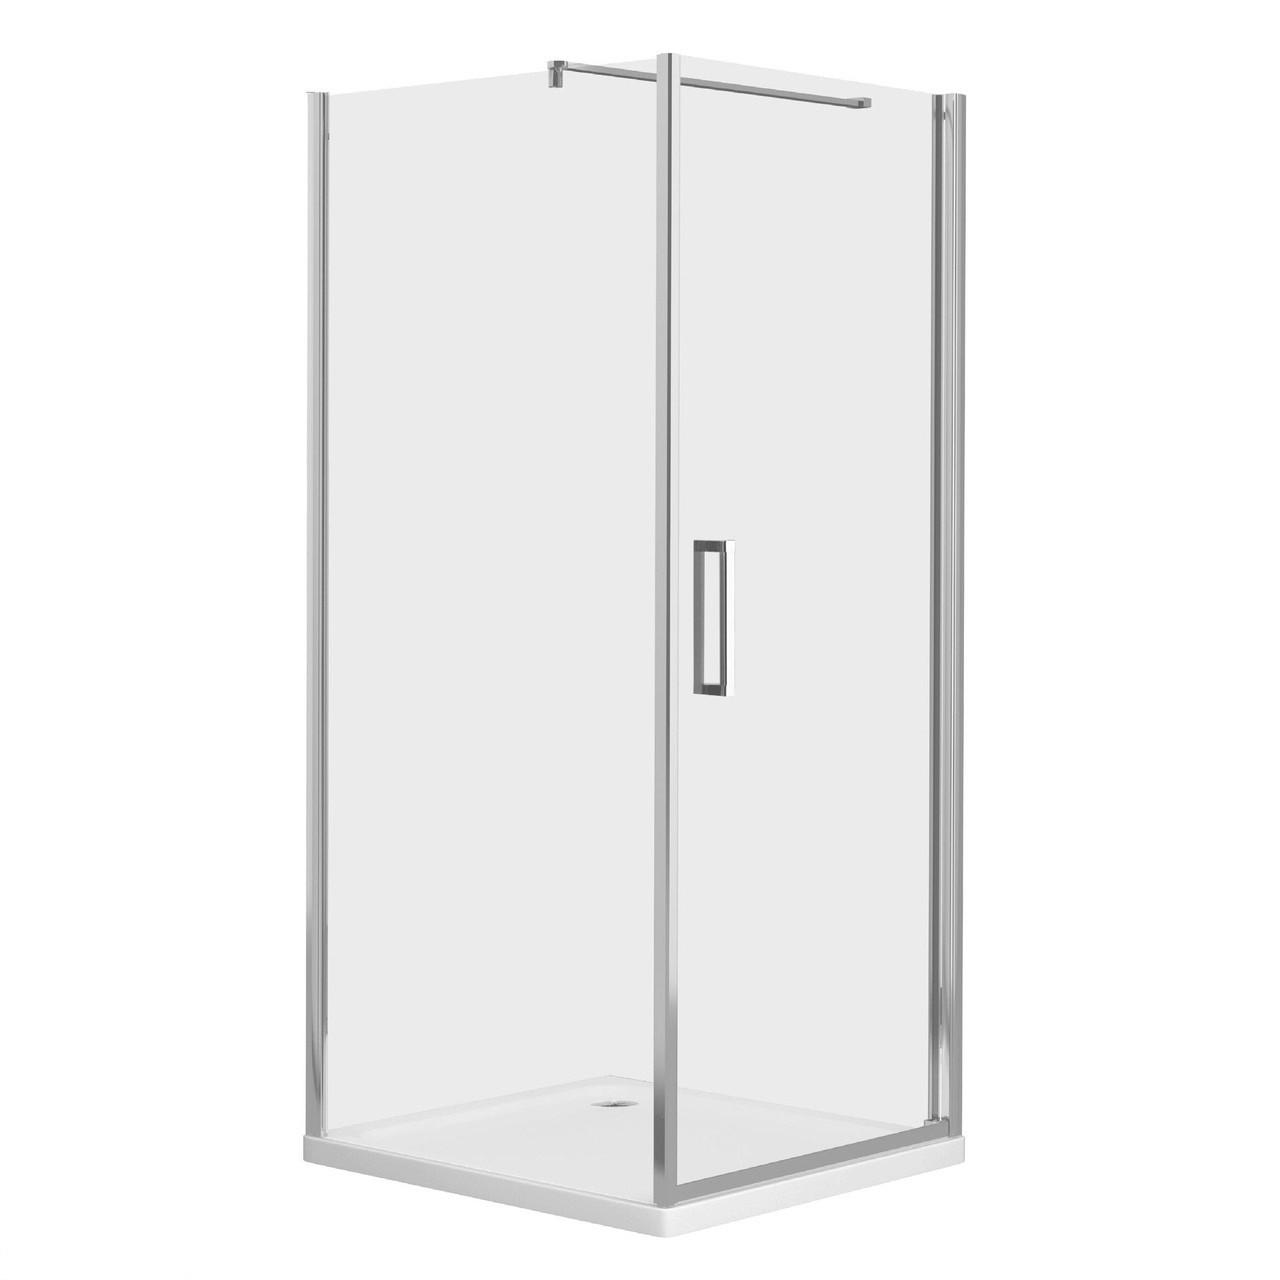 RUDAS душова кабіна квадратна 90*90*205 см, піддон (PUF) 5 см (з сифоном), орні, скло прозоре, права